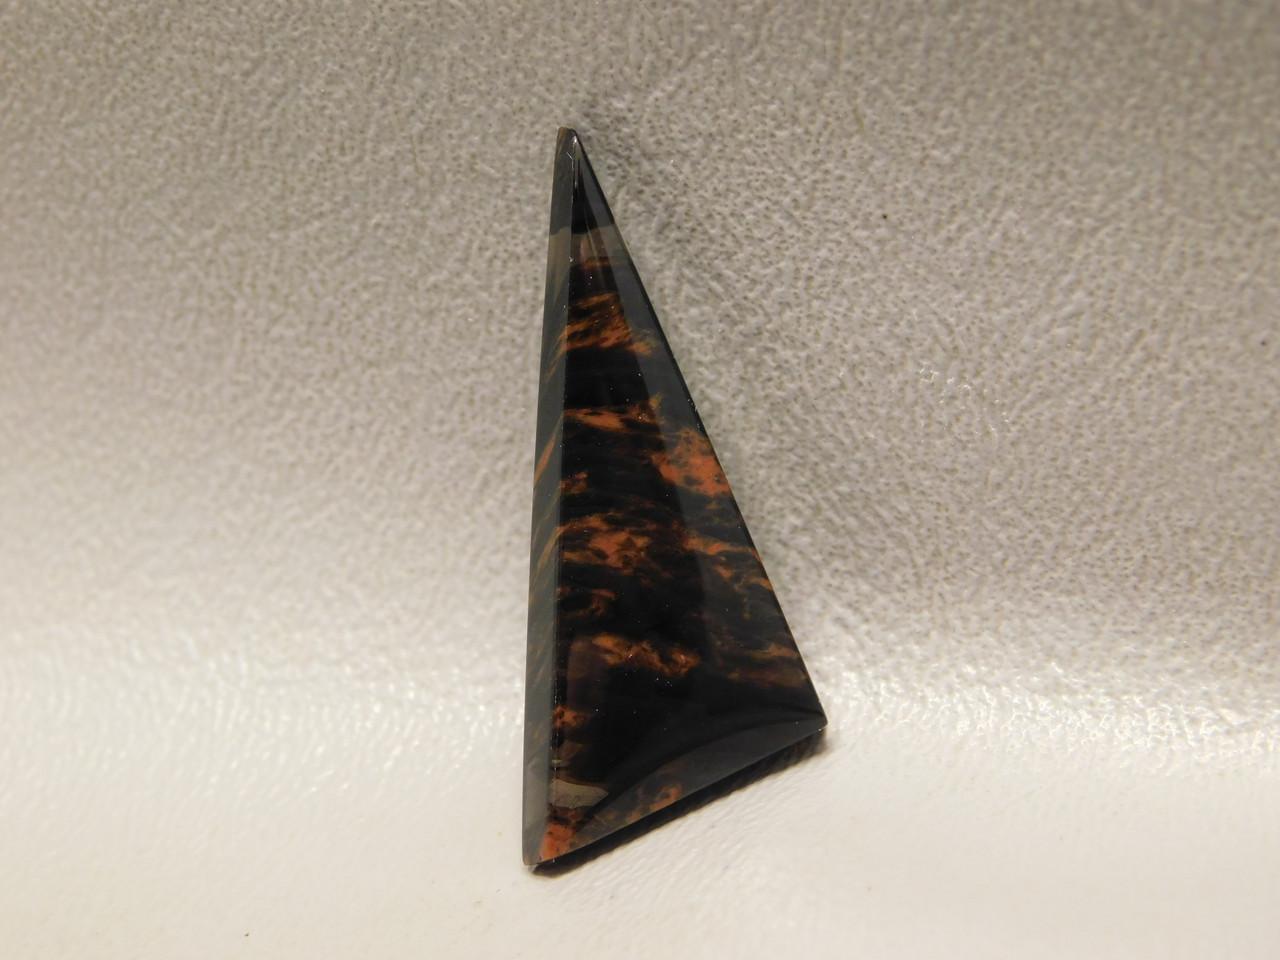 Mahogany Obsidian Cabochon Triangle Black and Red Gemstone #1